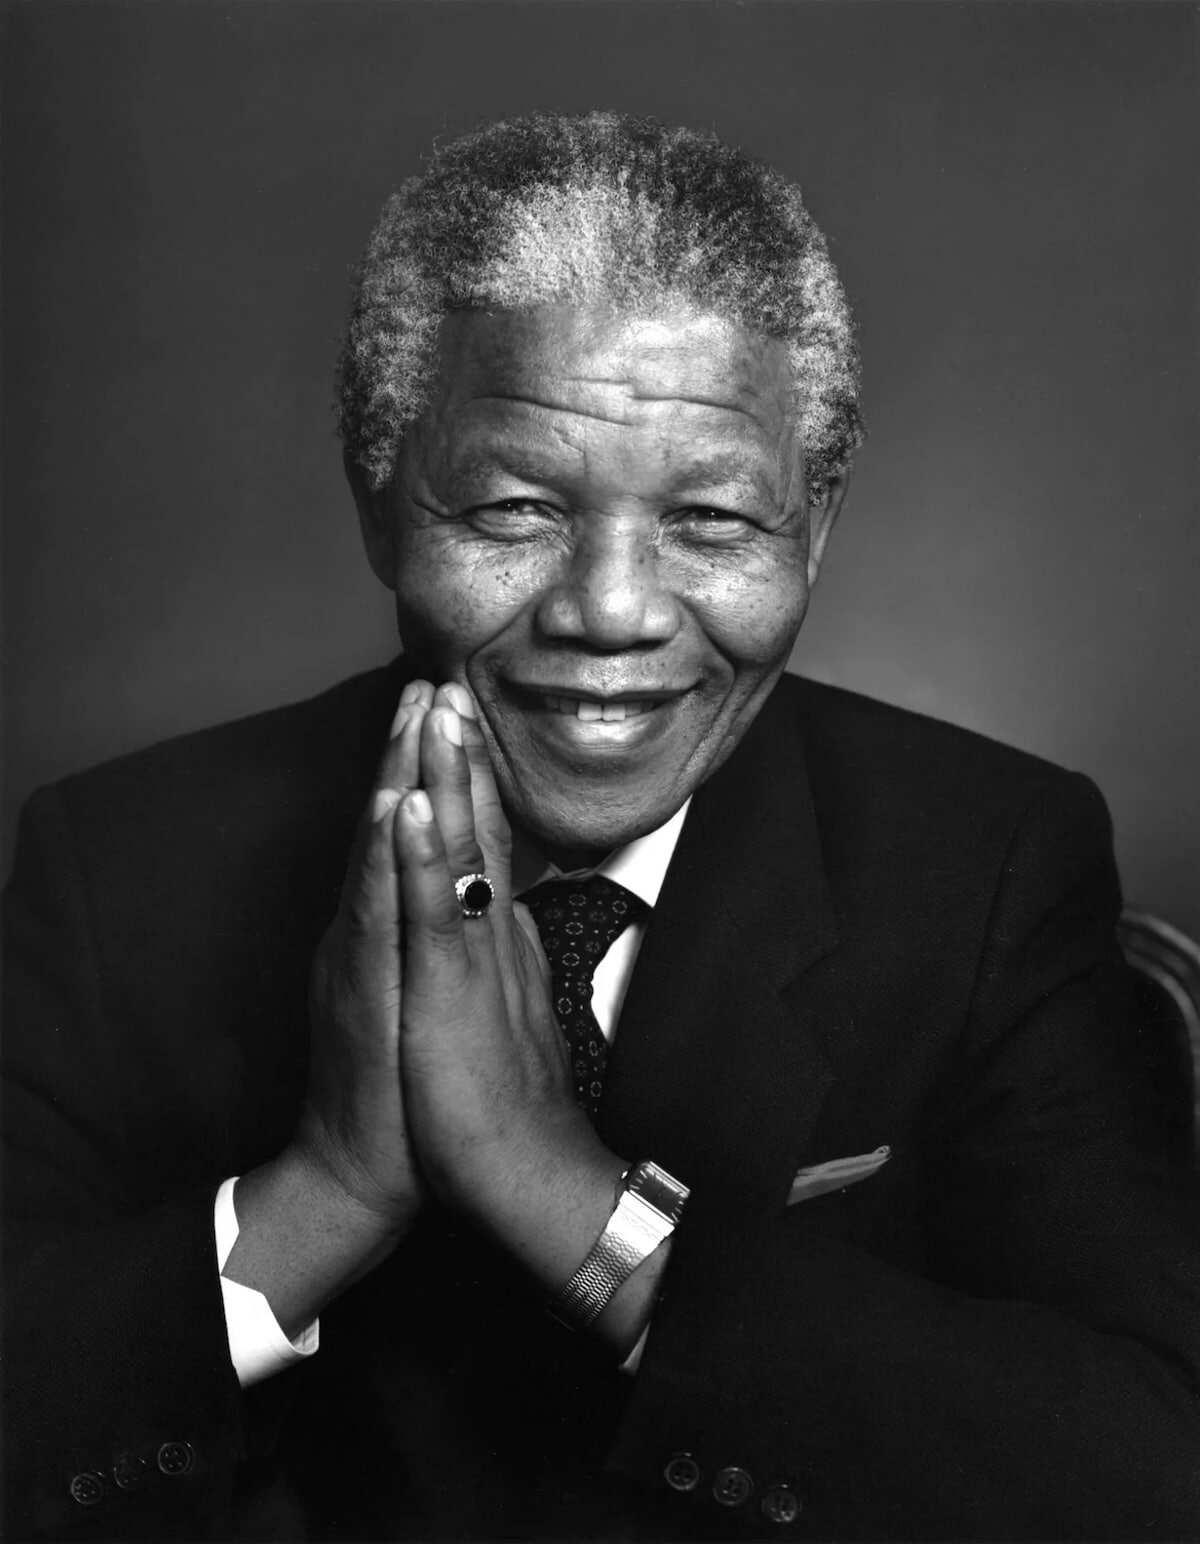 Citaten Nelson Mandela : Remembering nelson mandela on the anniversary of his inauguration